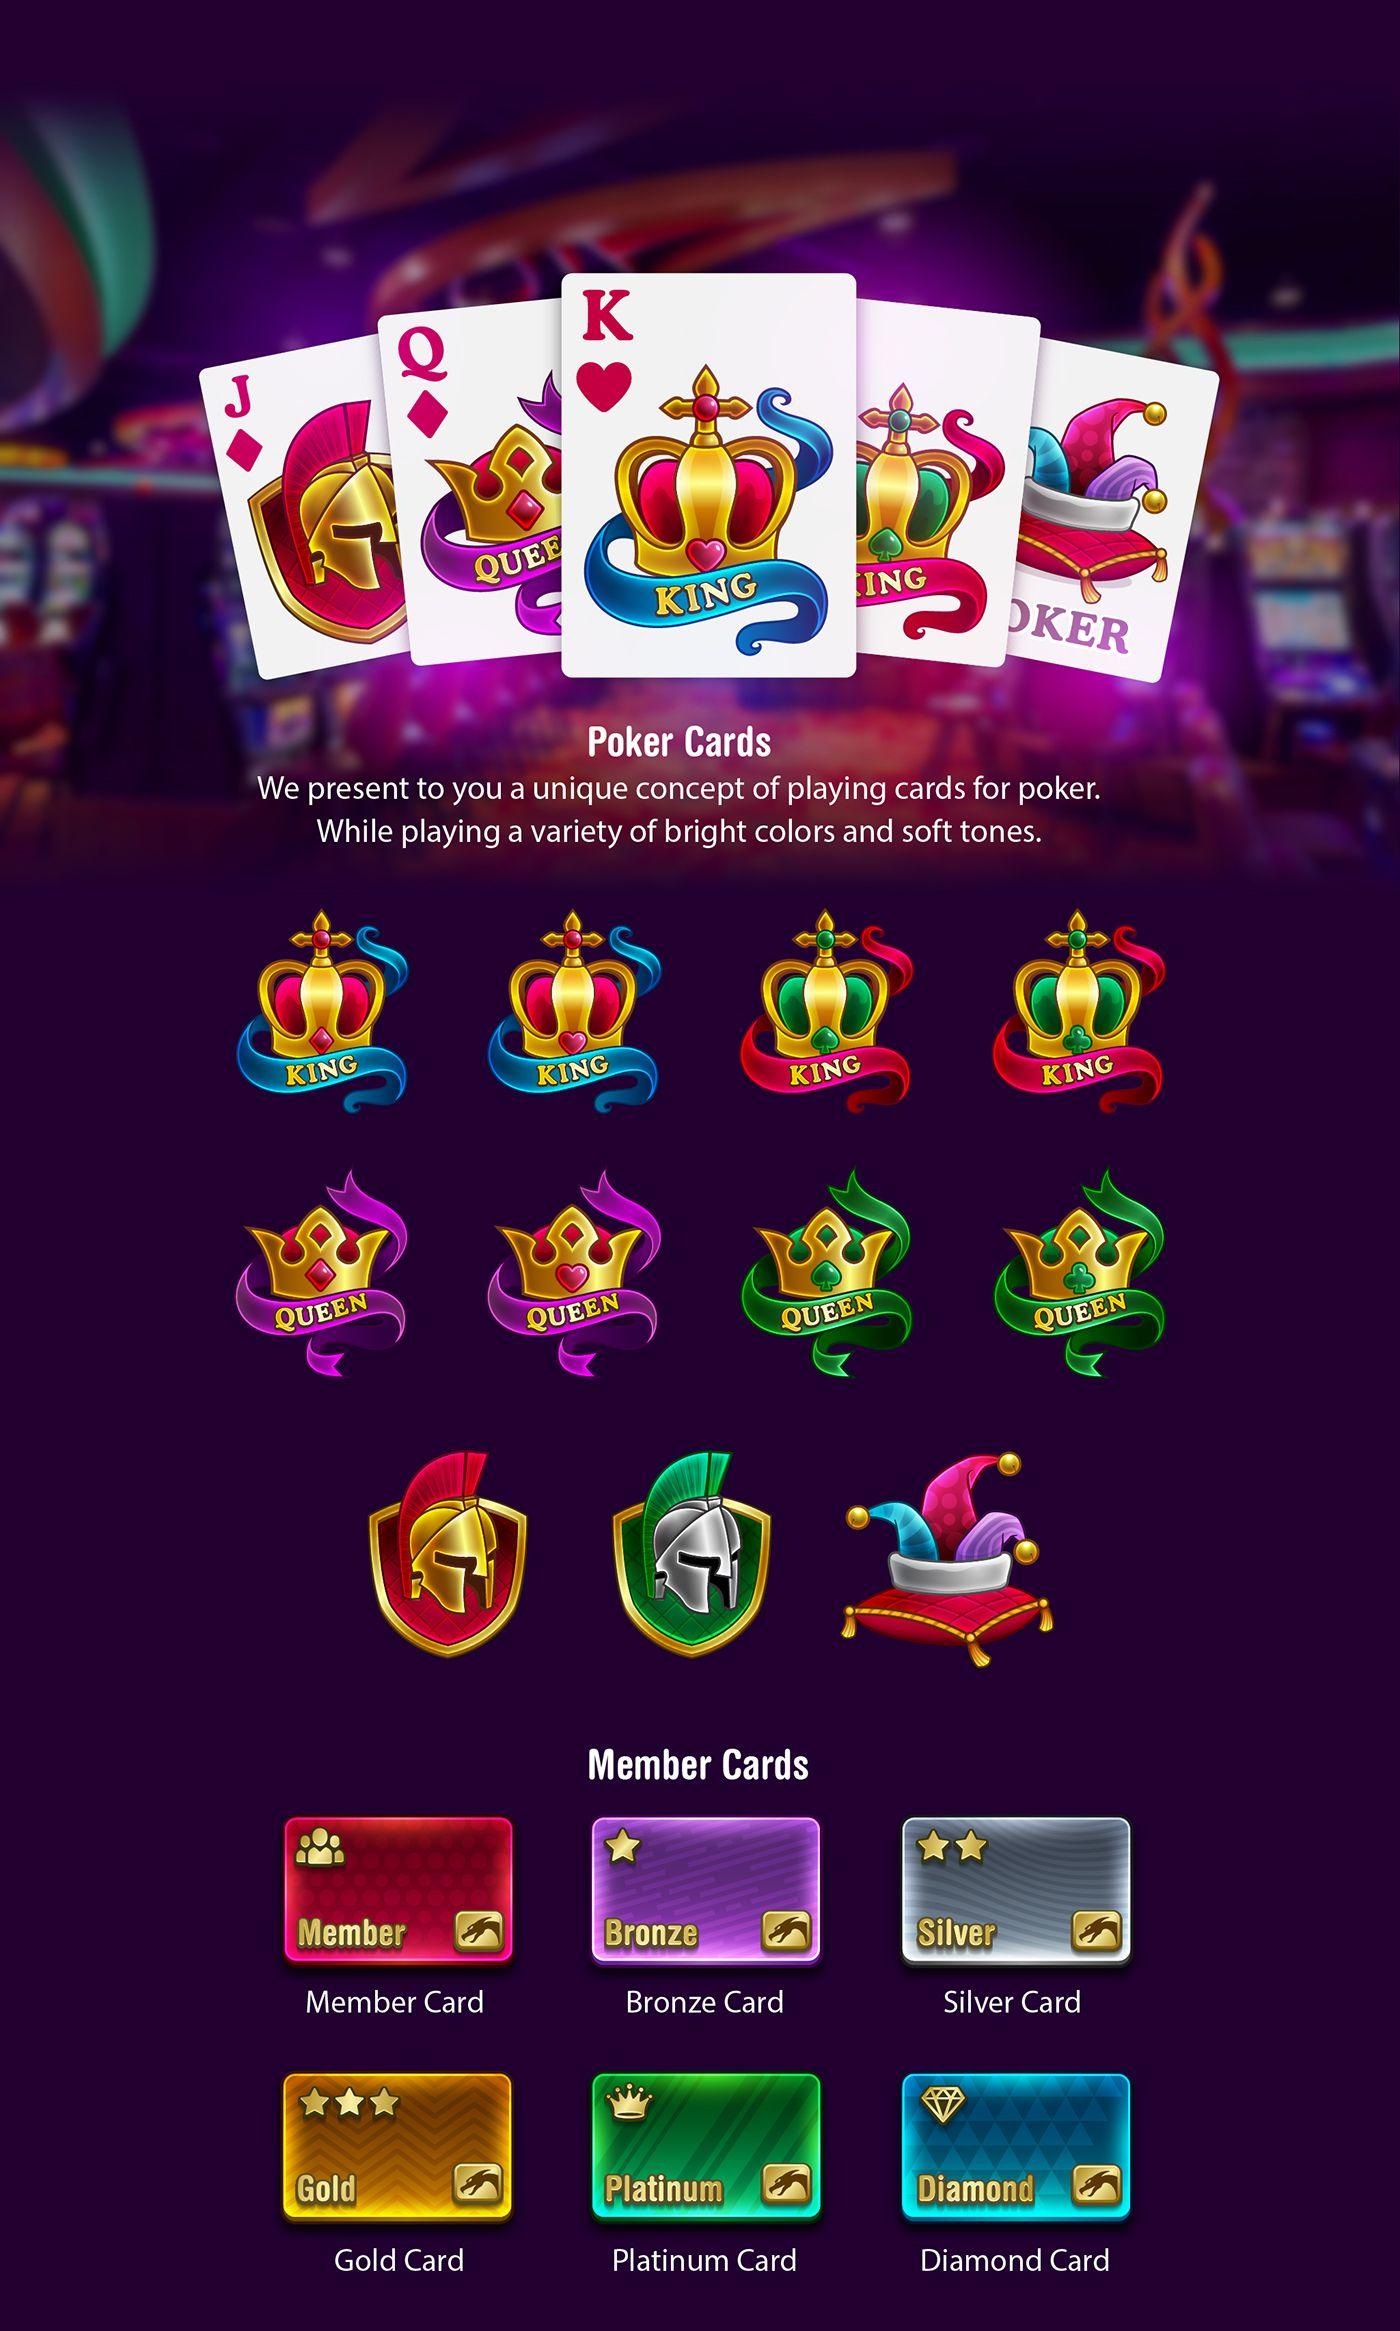 Tabla poker general opiniones tragaperra Cash Stampede-990252